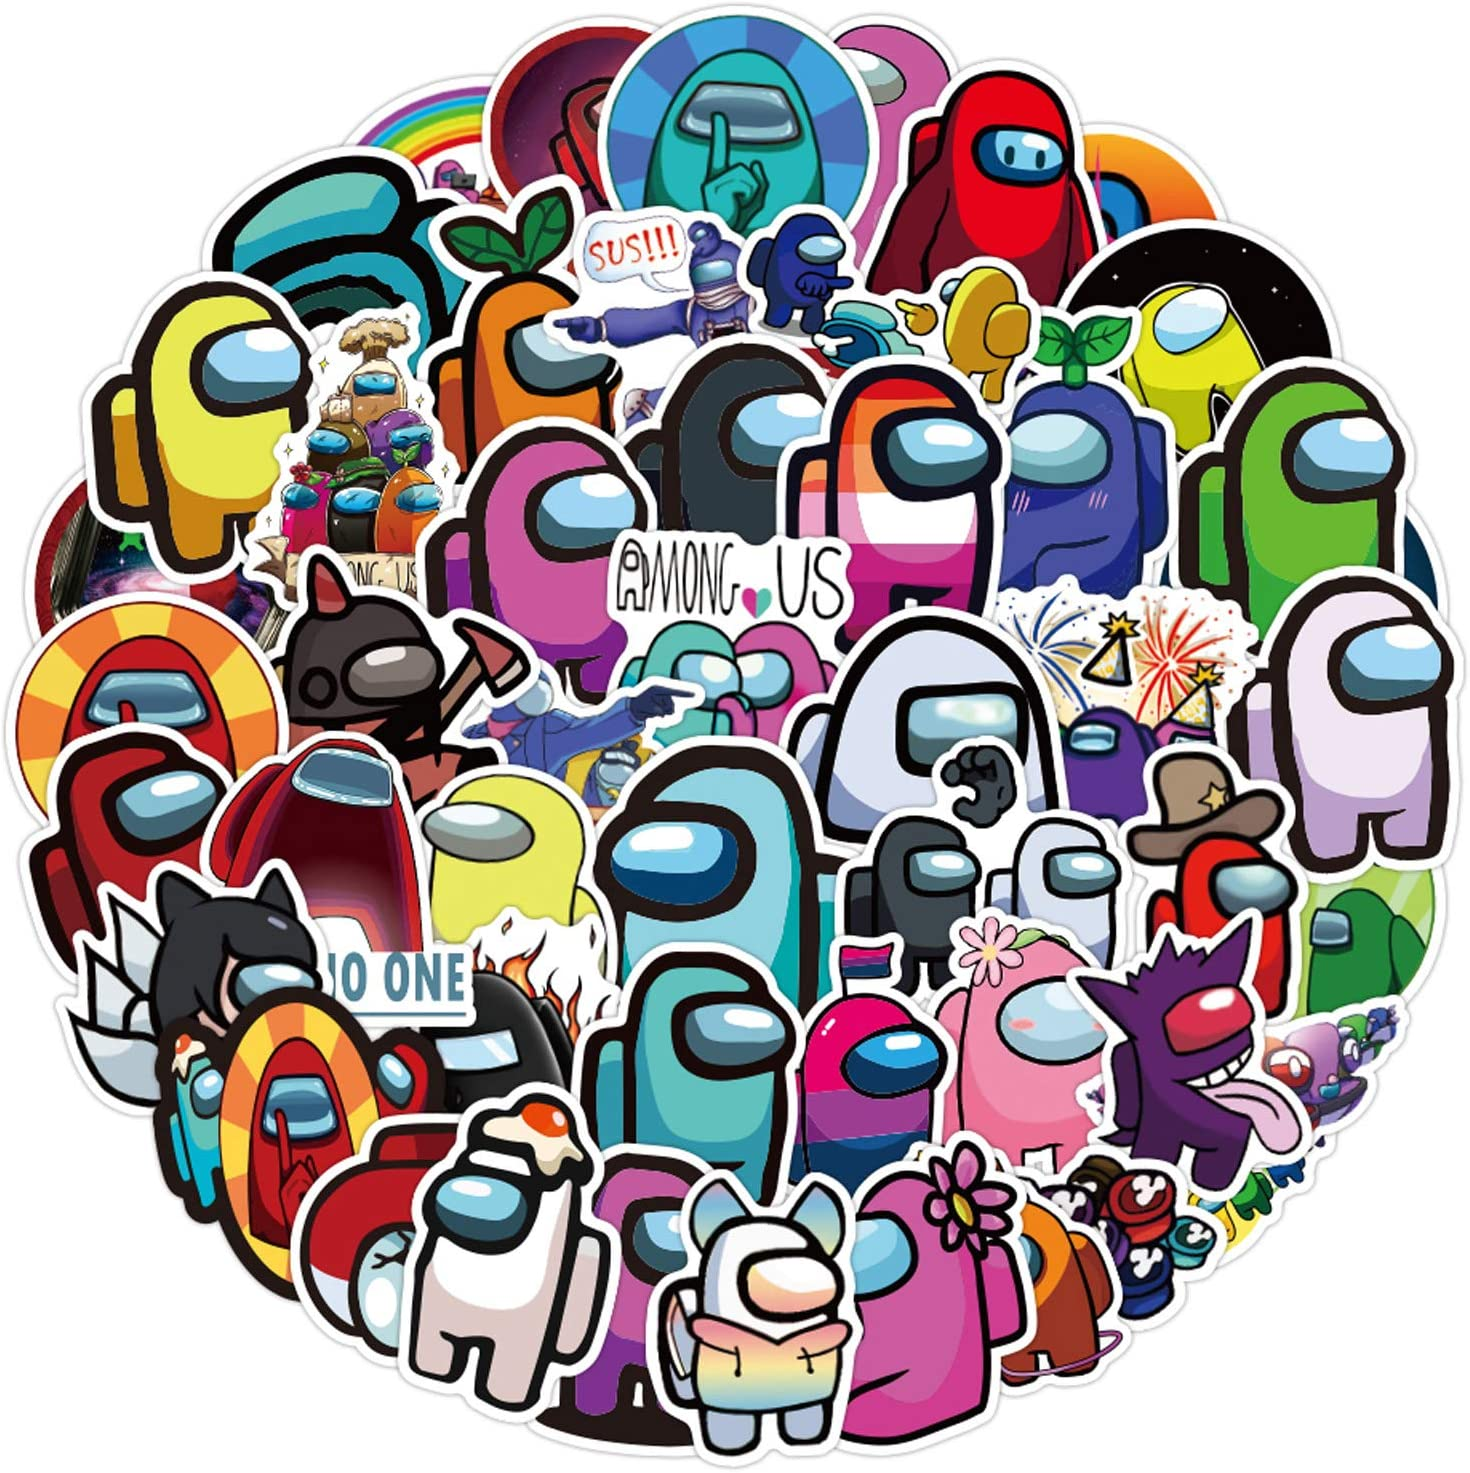 AdnesUSA Among Us Carton Game Sticker 50 Pcs,DIY Decoration as Gift Waterproof Merch Cute Vinyl Sticker Special Character Decal for Laptop,Skateboard,Water Bottle,Laptop…